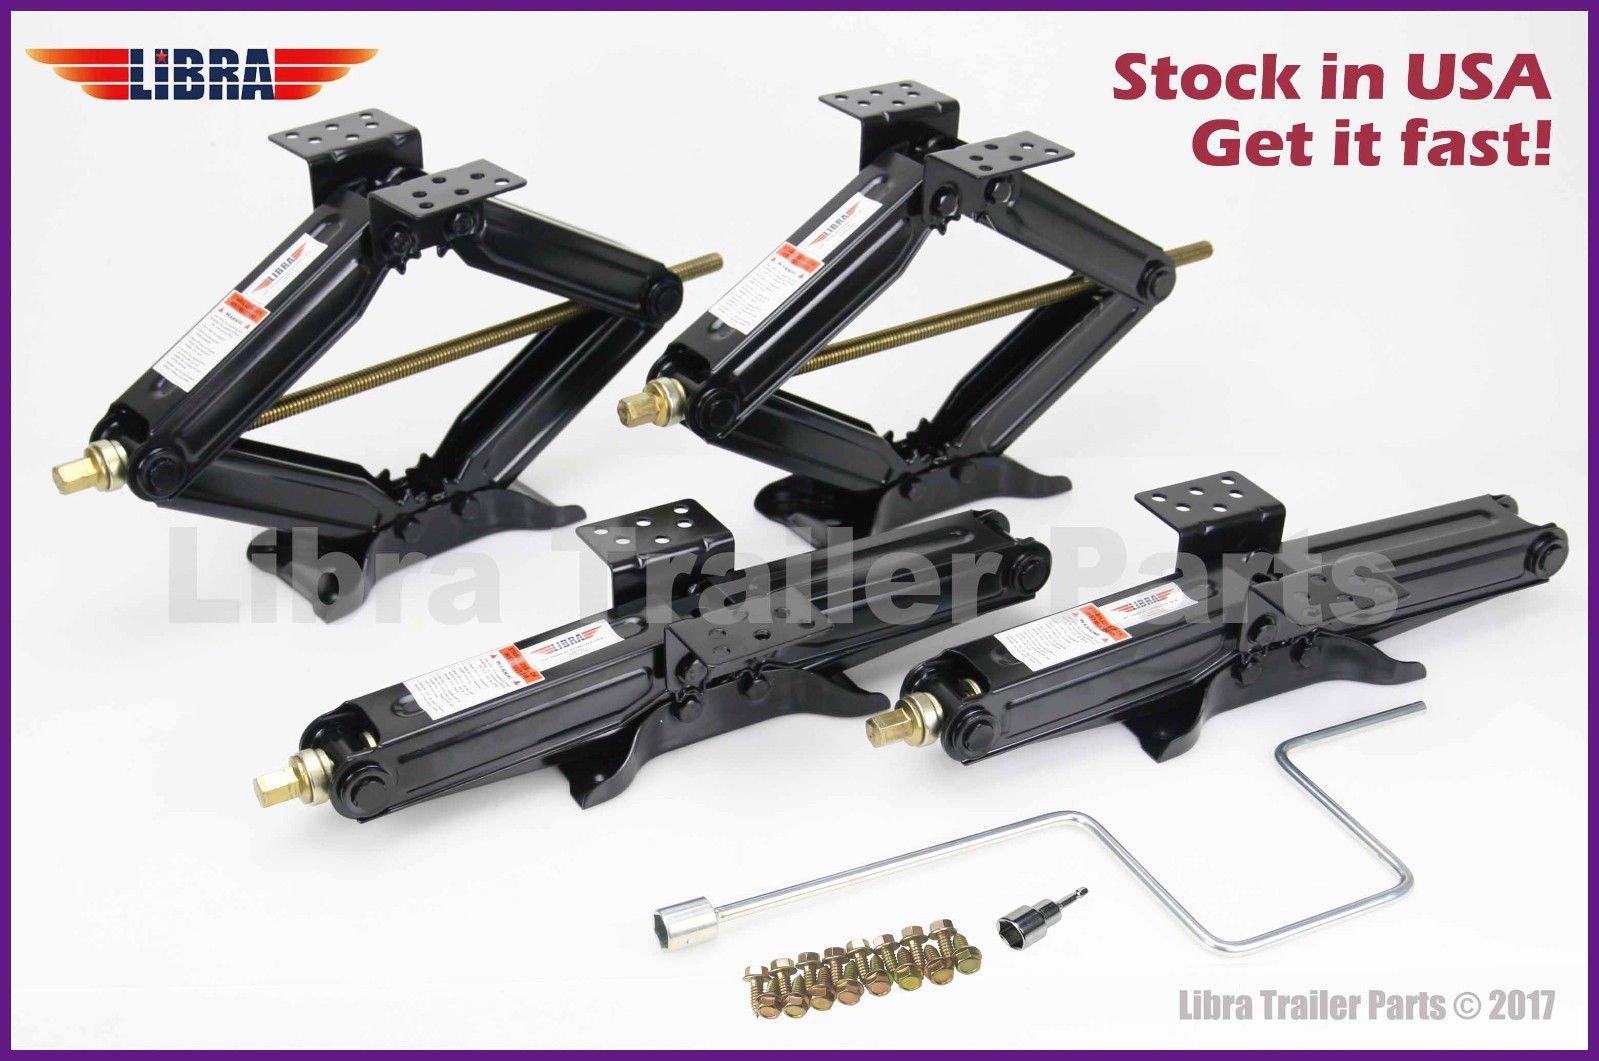 Set of 4 5000lbs 20'' RV Trailer Stabilizer Leveling Scissor Jacks w/handle & Power Drill Socket & Mounting hardware 26036